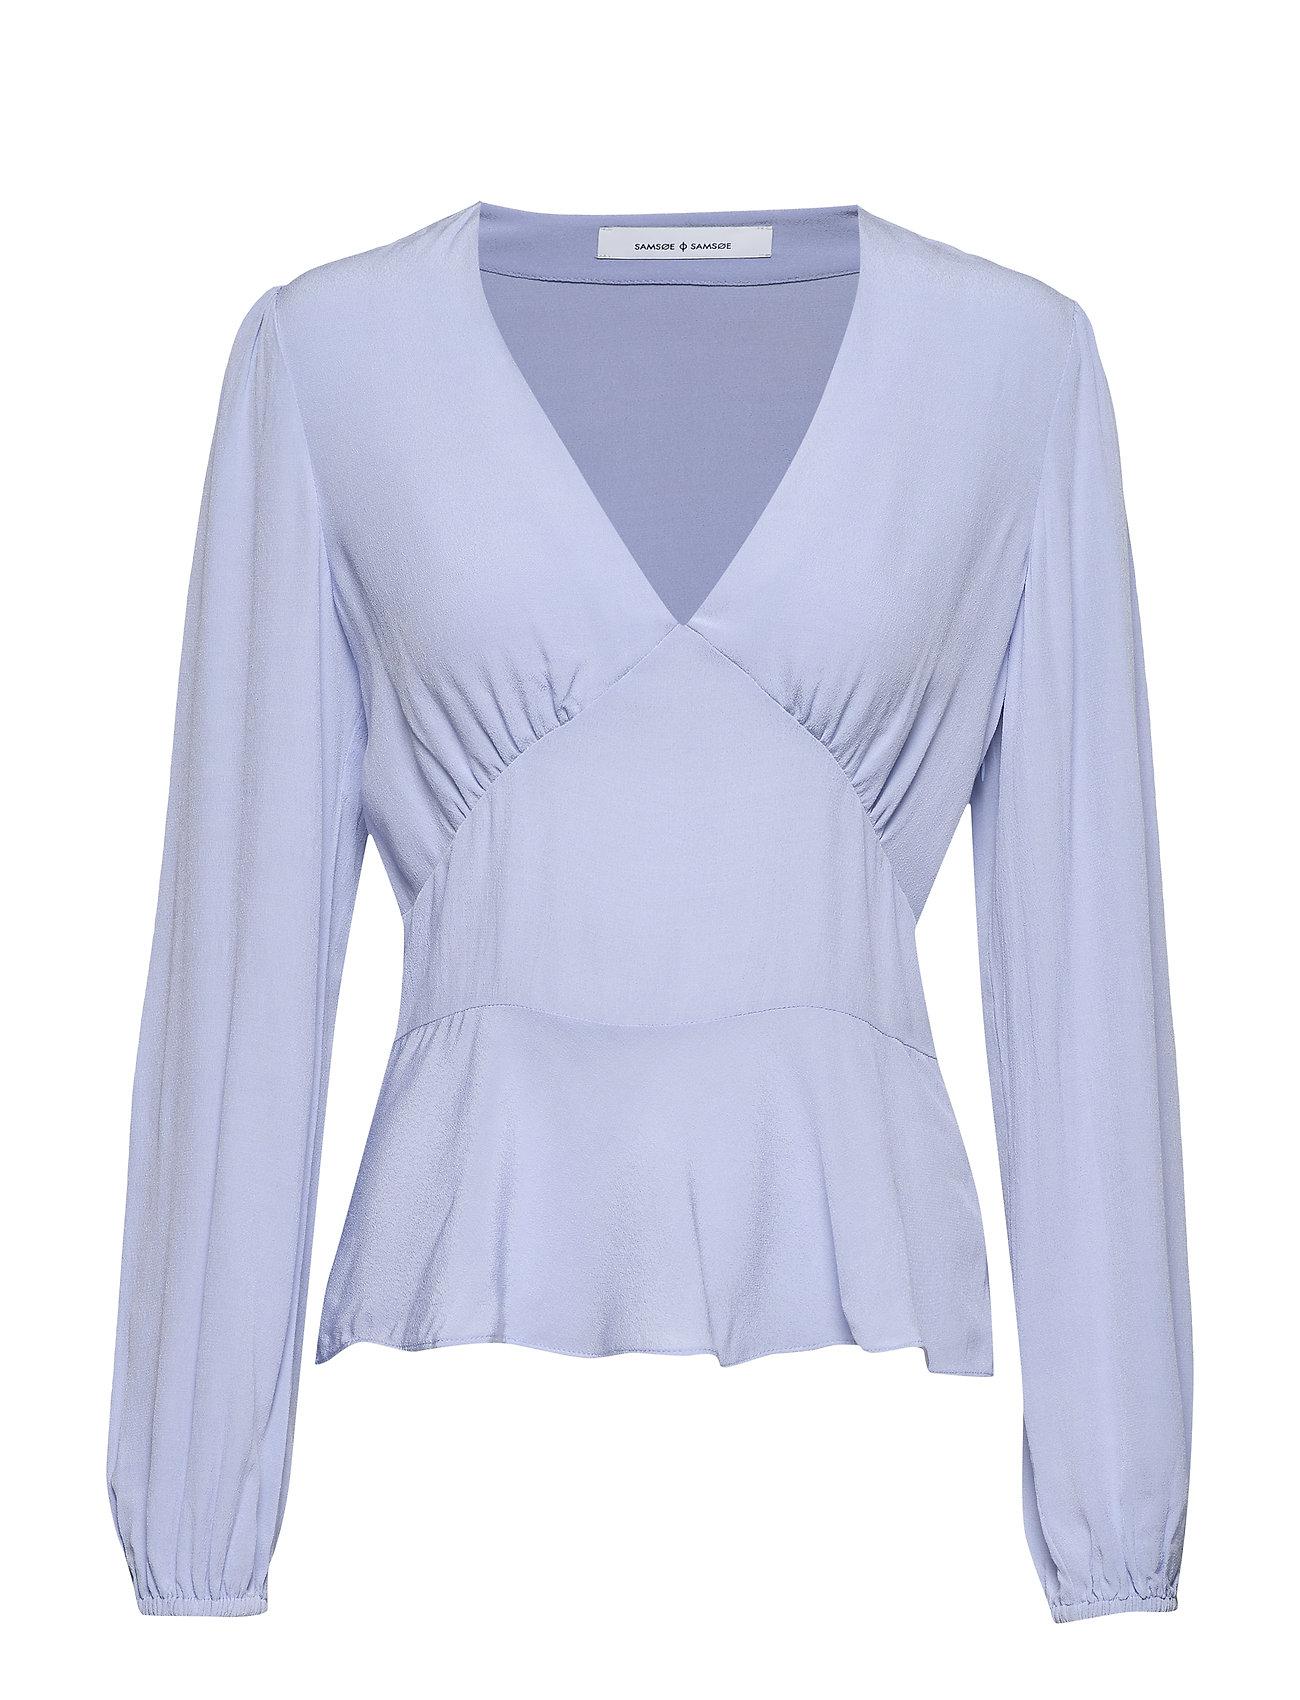 Samsøe & Samsøe Cindy blouse 10056 - ZEN BLUE